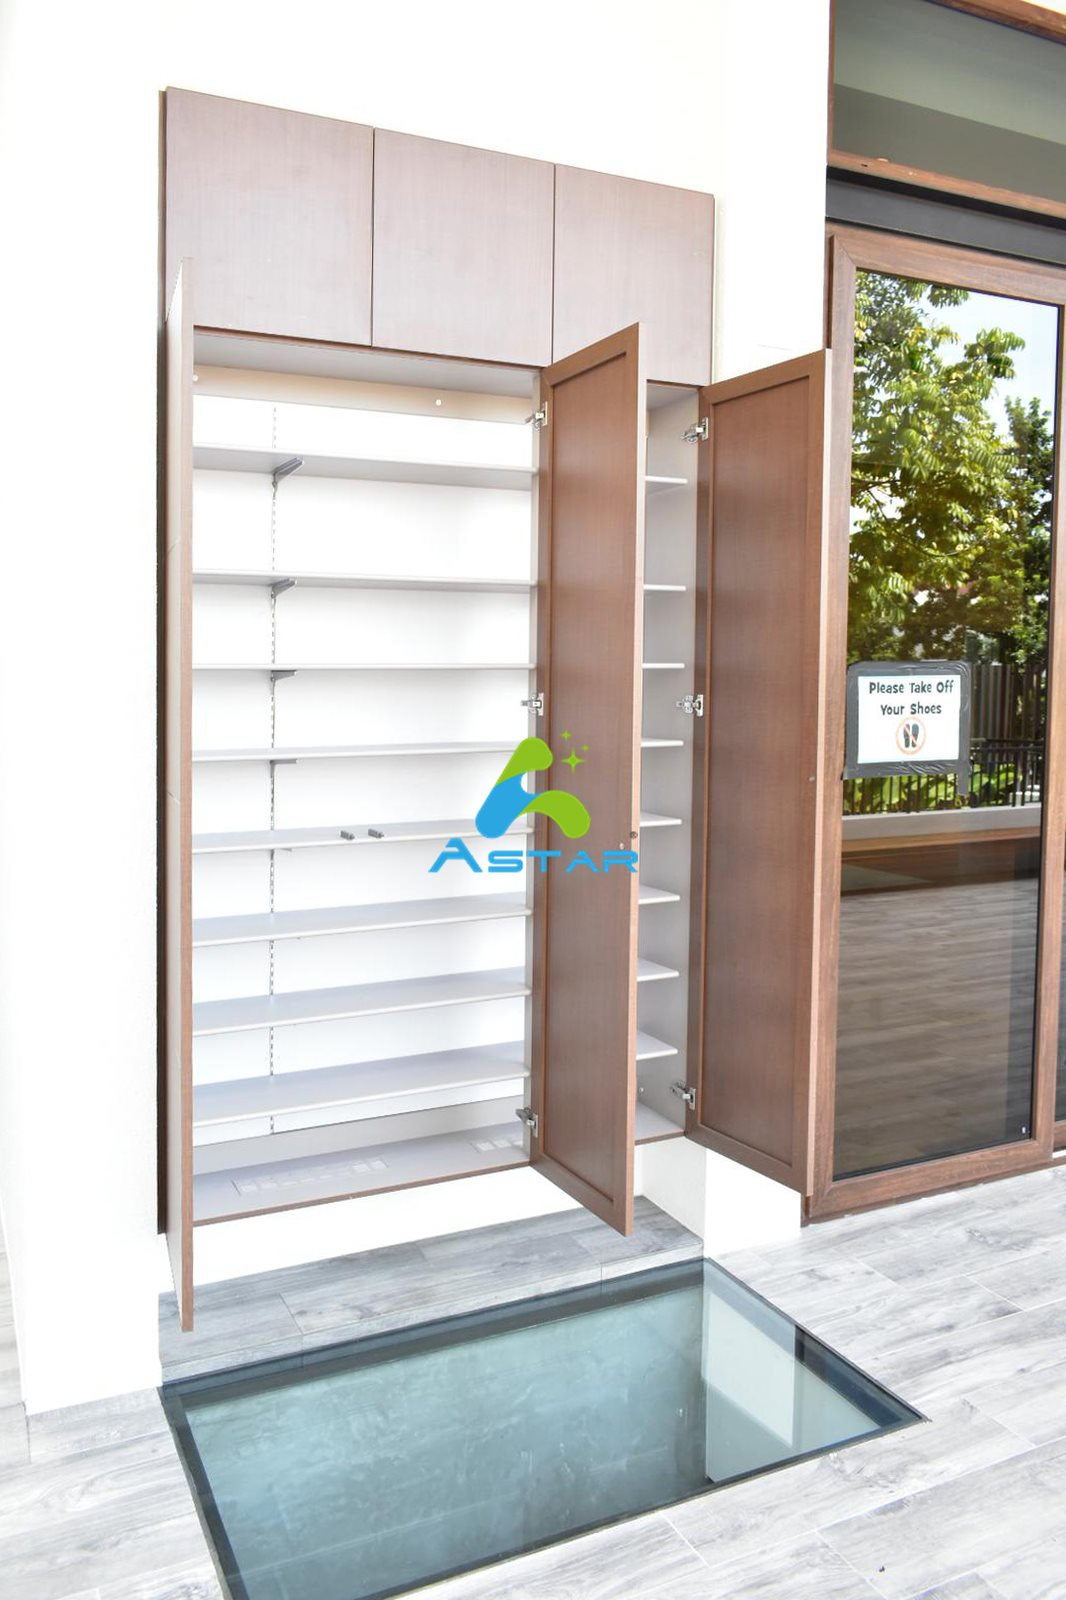 astar furnishing complete projects aluminium kitchen cabinet vanity cabinet wardrobe gardenia road 14